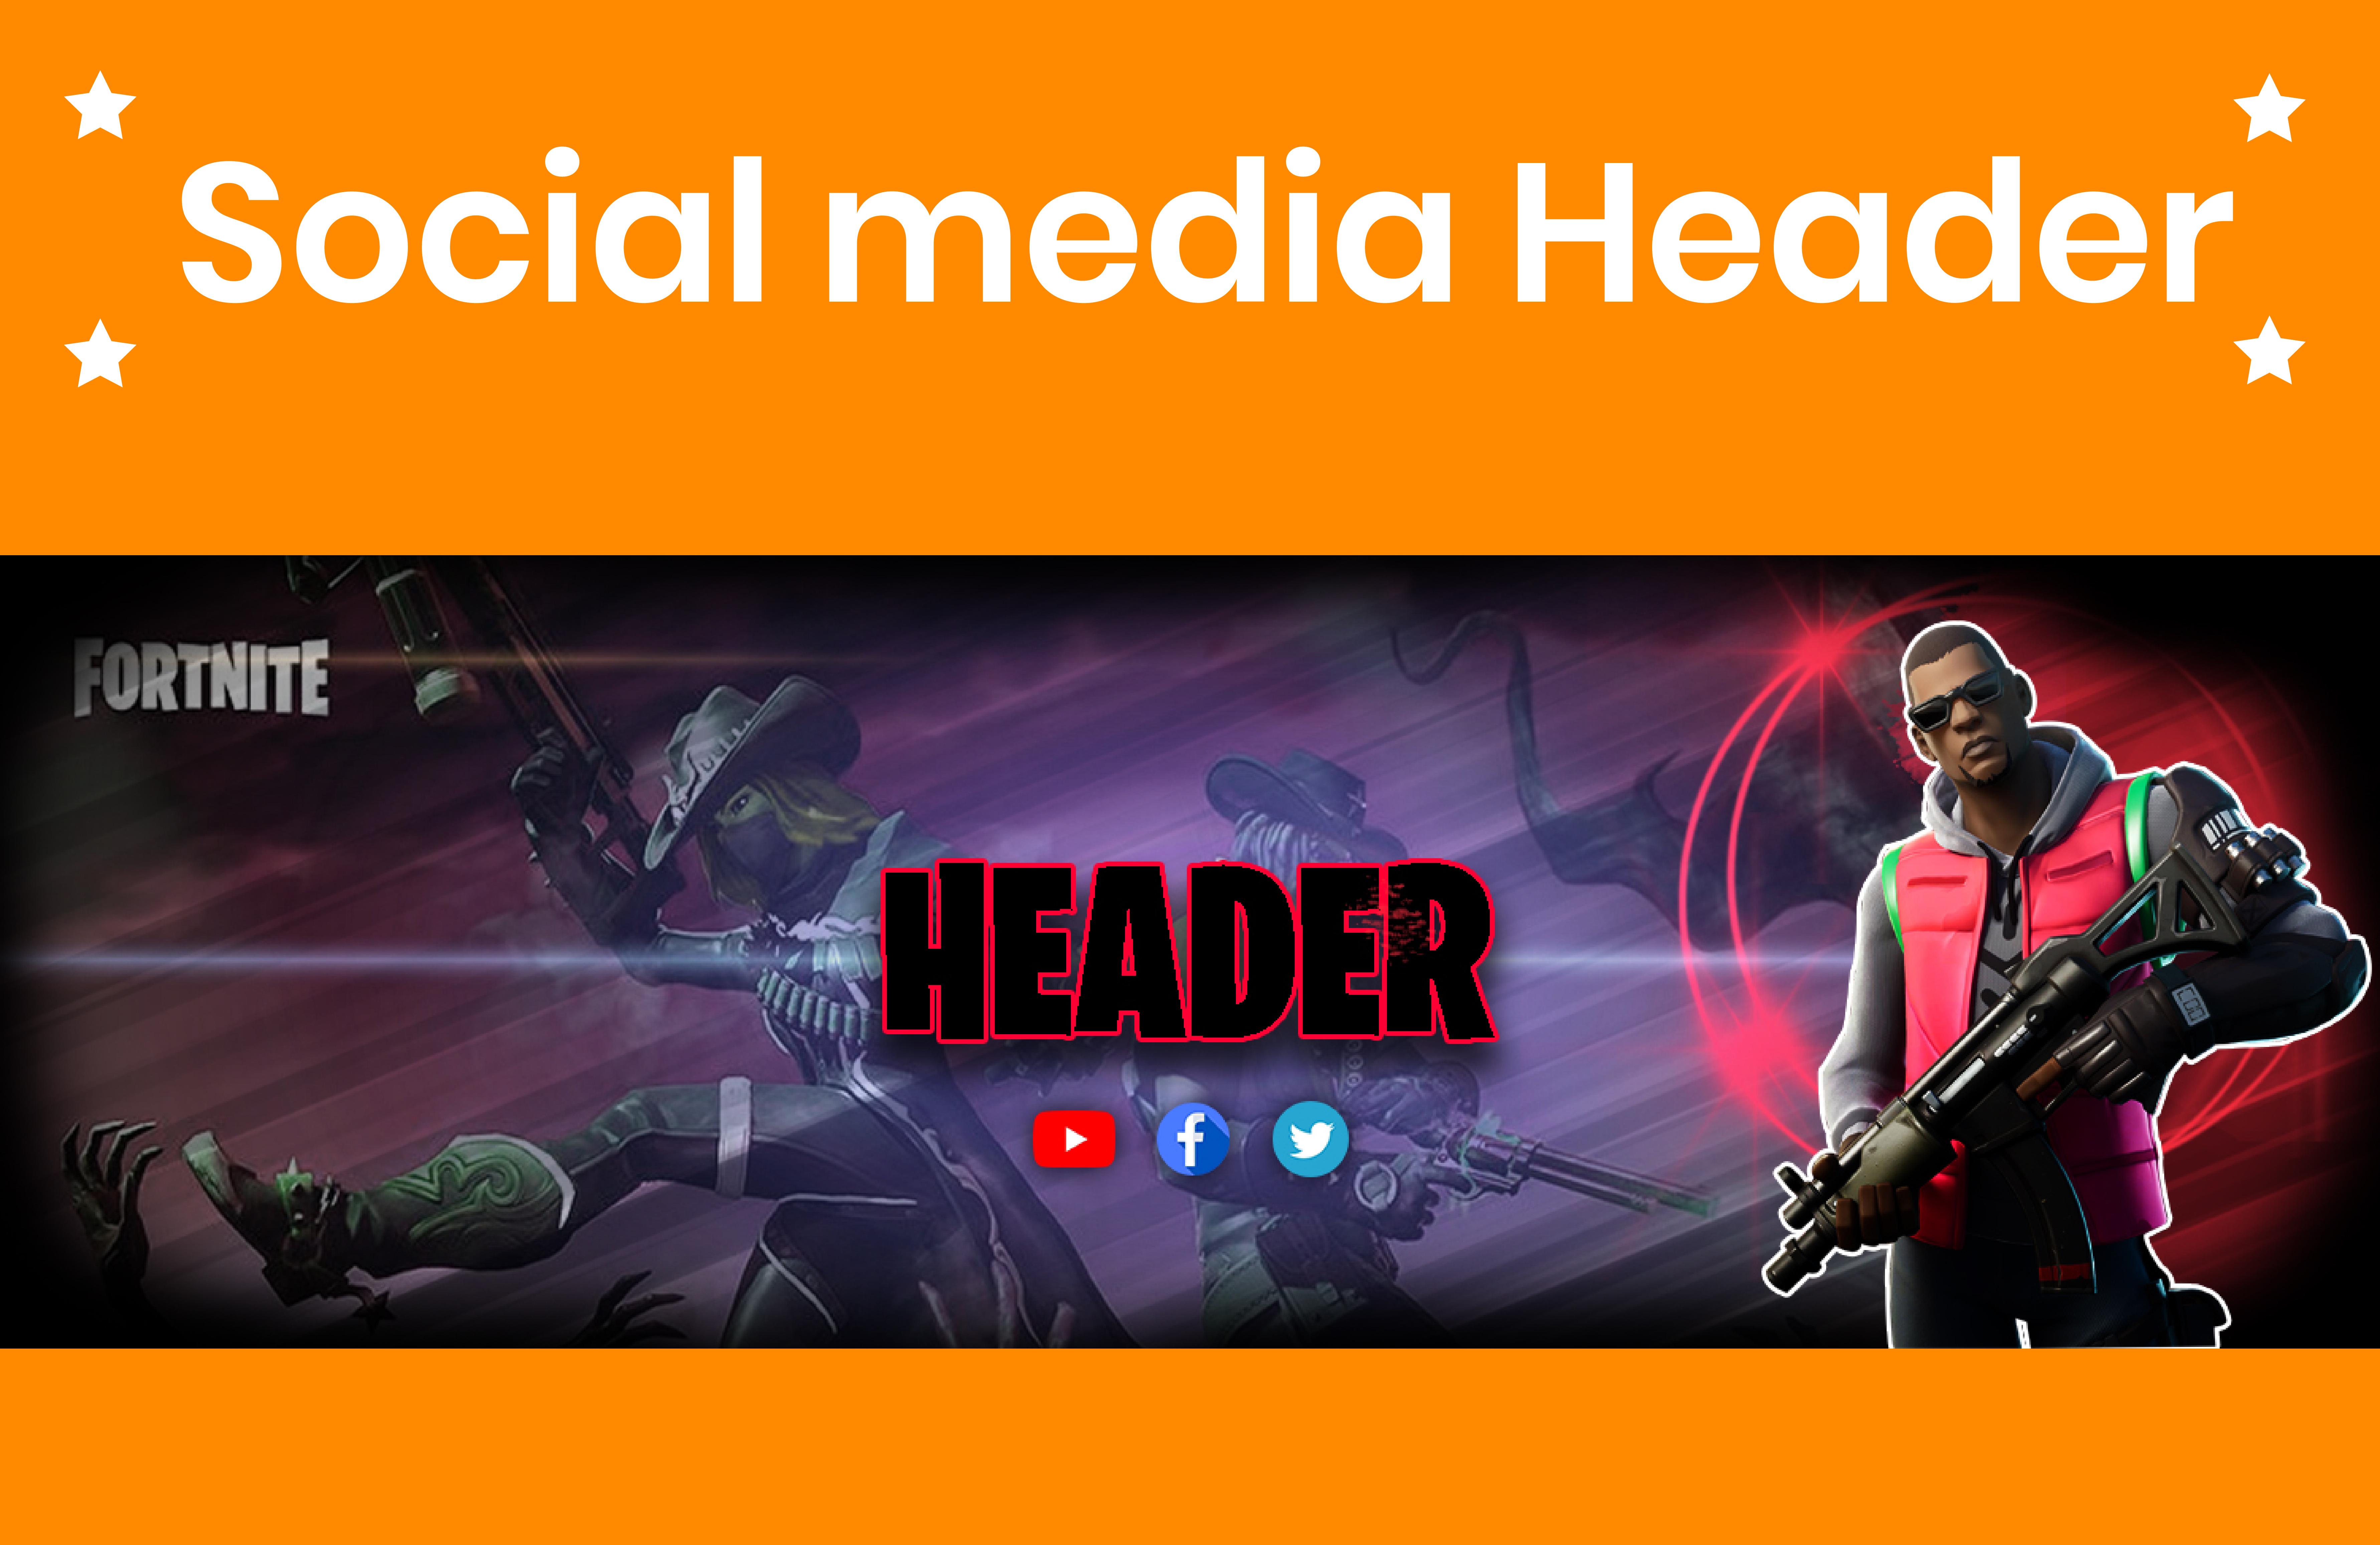 I will design stunning Facebook cover, header, or social media cover